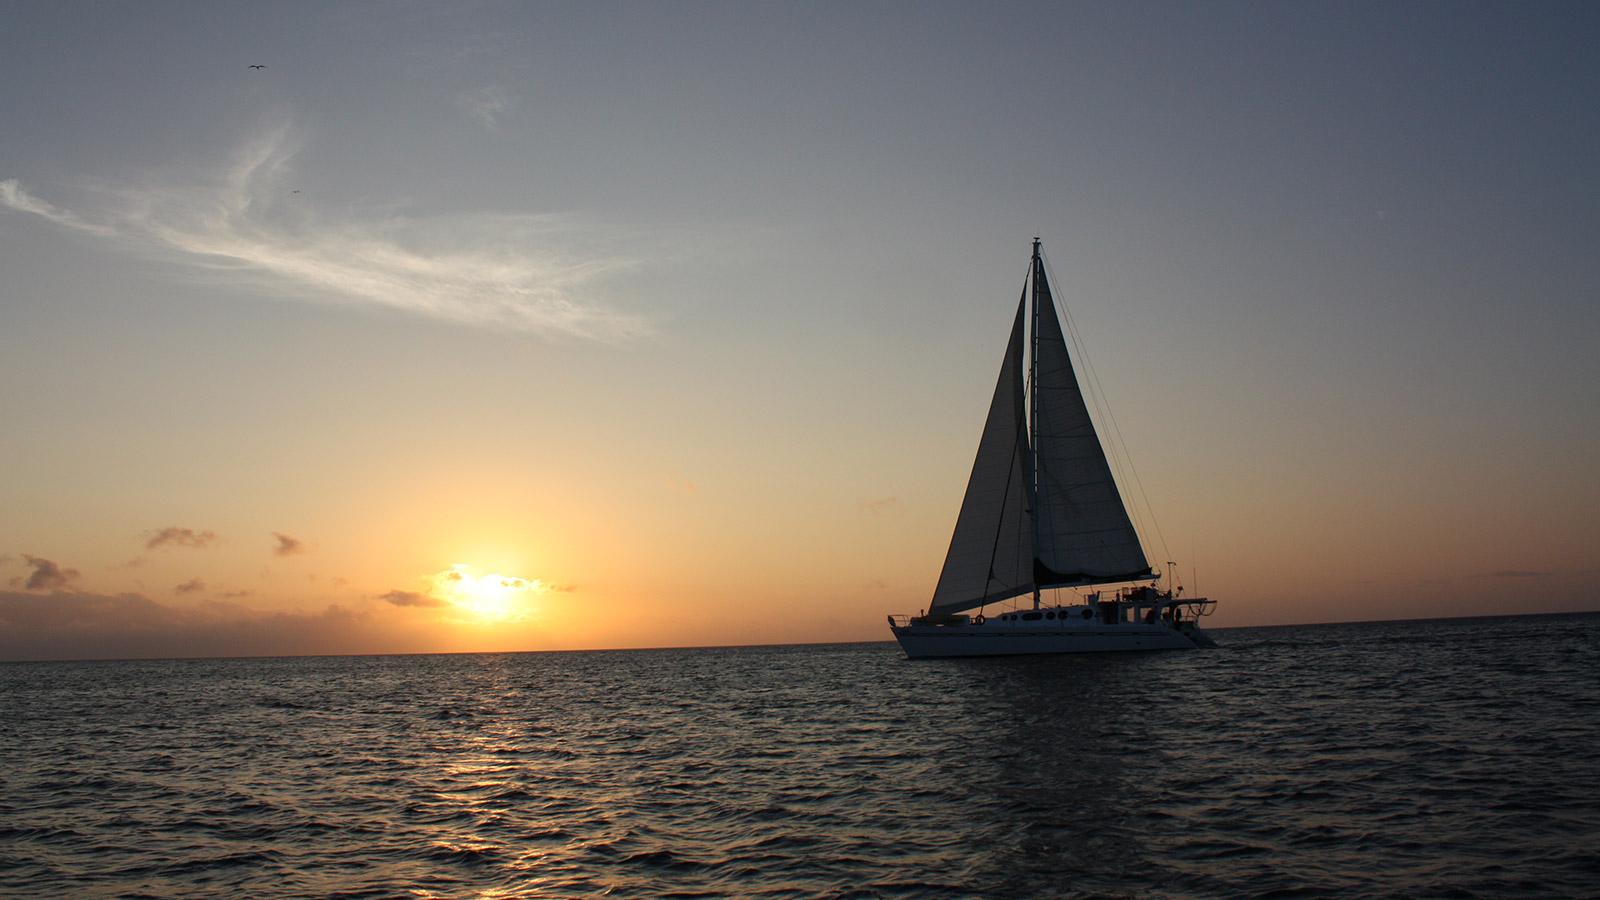 Segeltörn Galapagos Inseln bei Ecuador - Südamerika